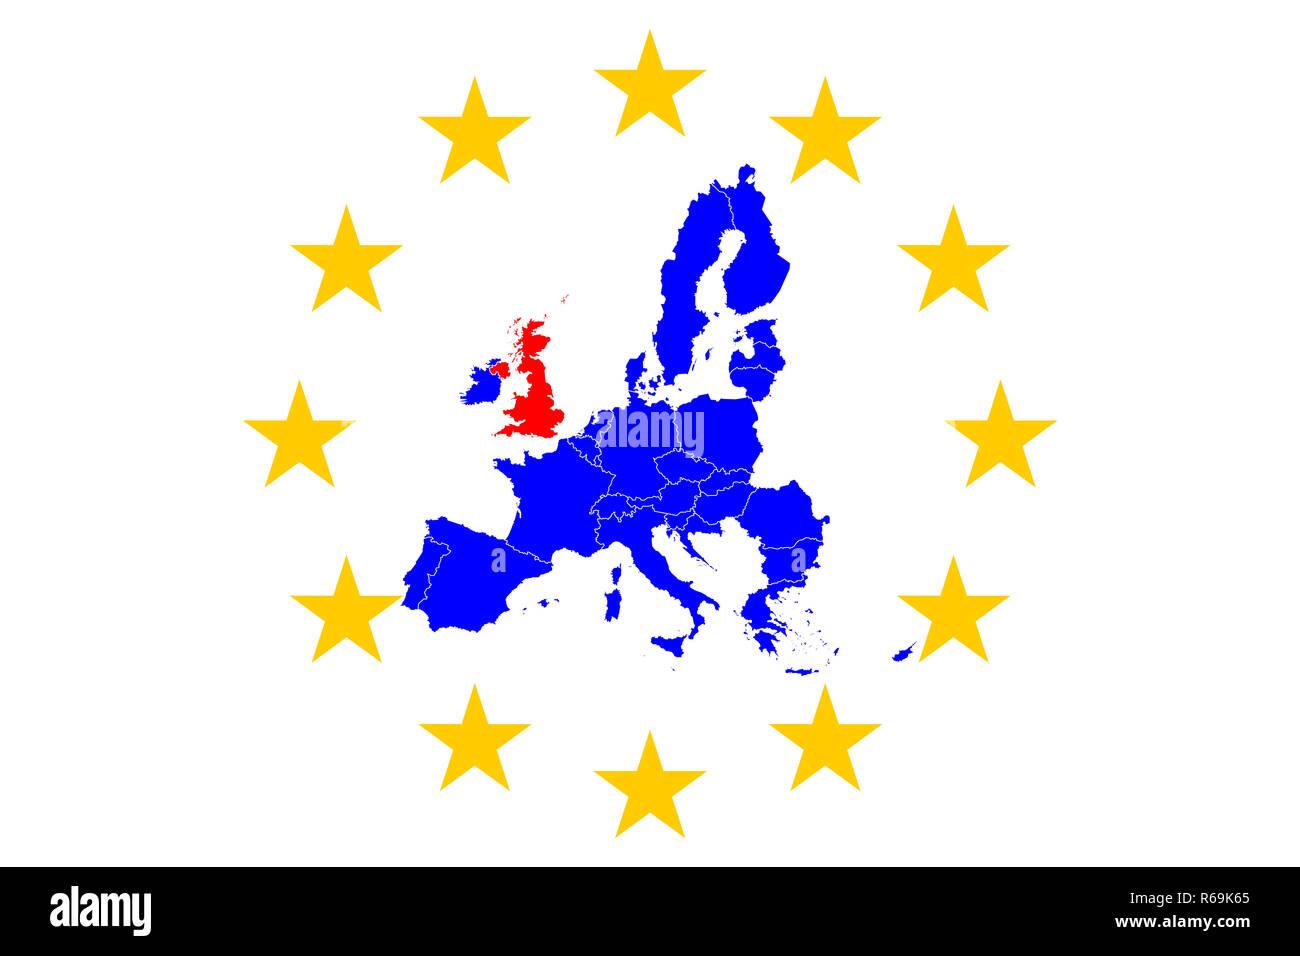 Brexit European Map With European Stars Circle - Stock Image